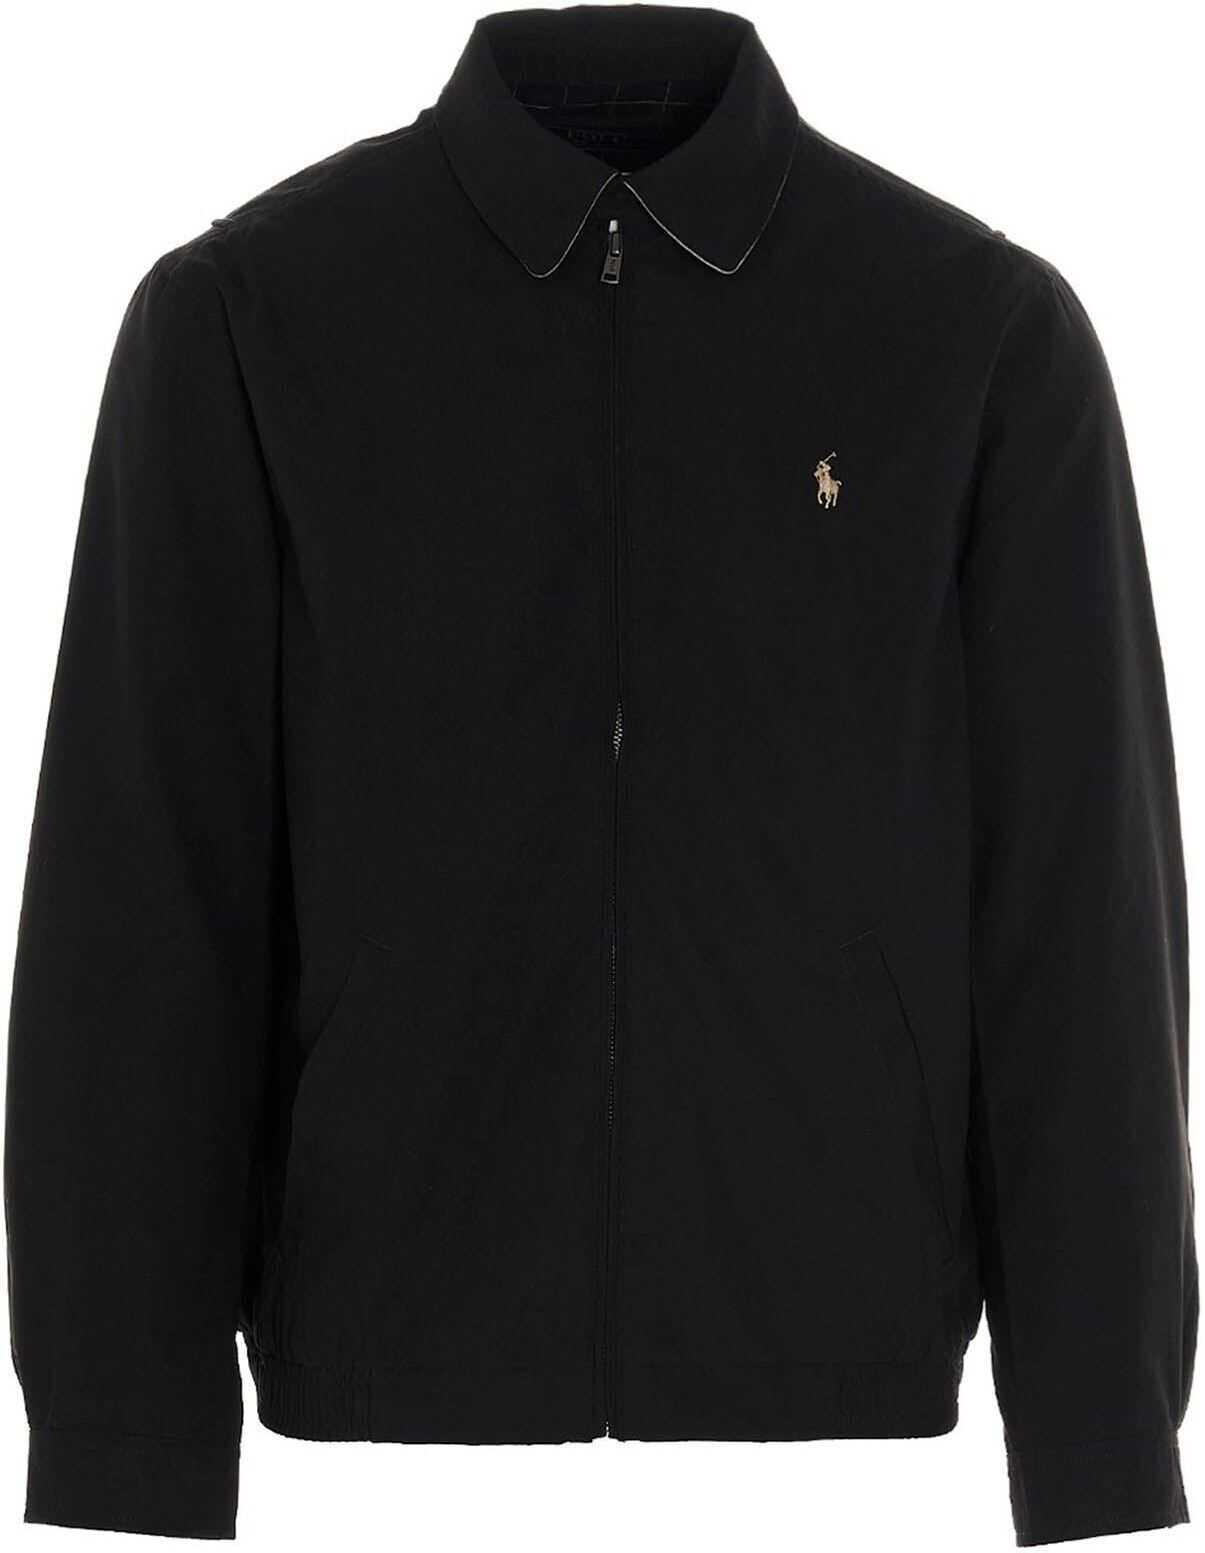 Ralph Lauren Bi-Swing Windbreaker Jacket In Black Black imagine